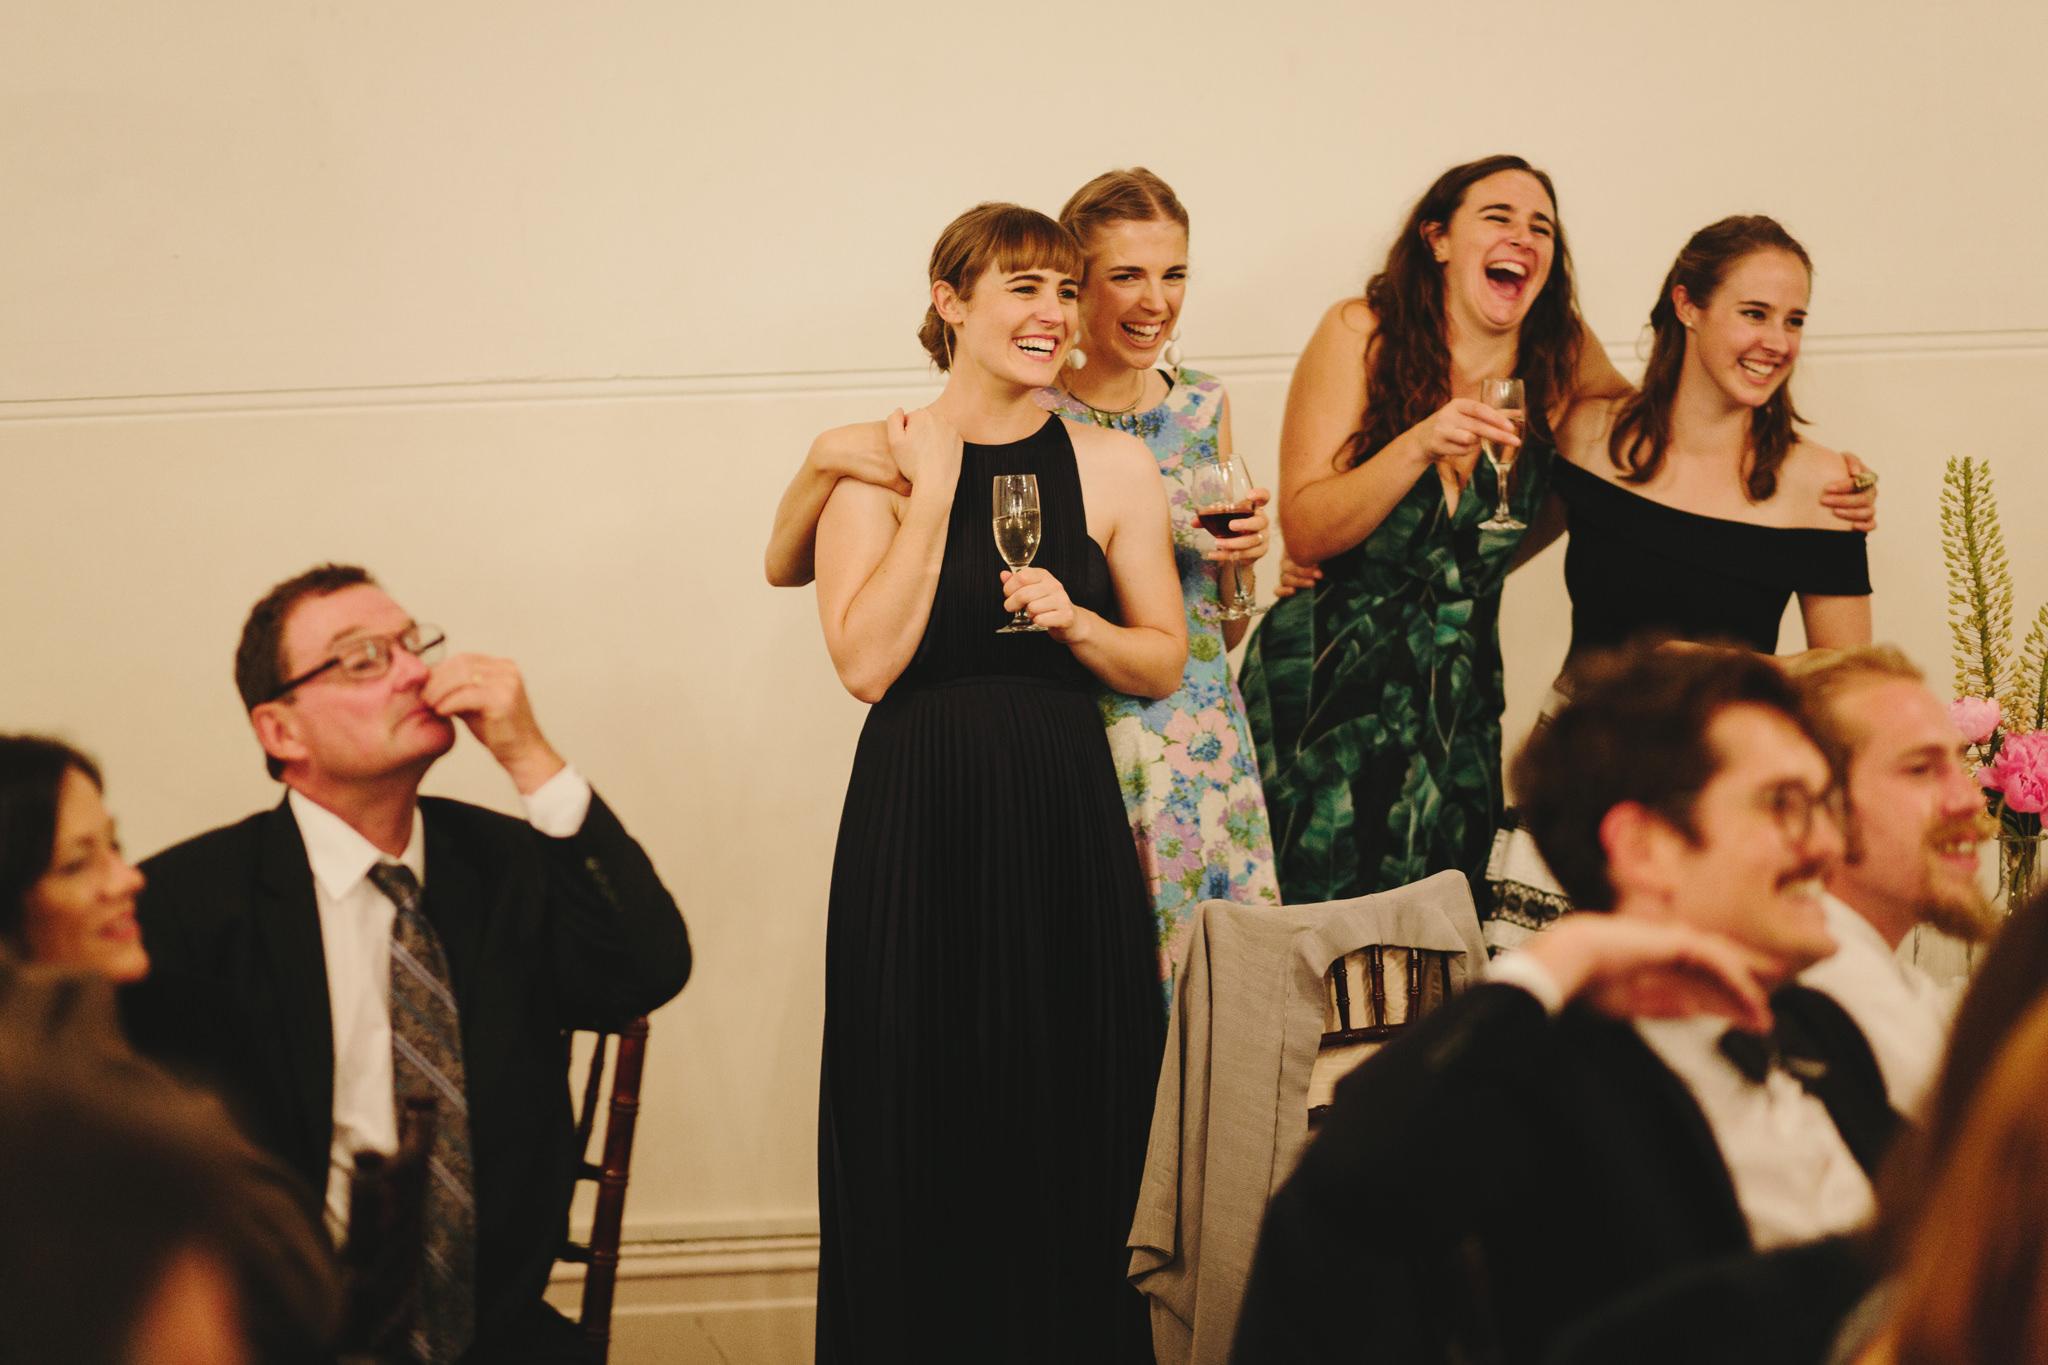 Abbotsford_Convent_Wedding_Peter_Anna136.JPG